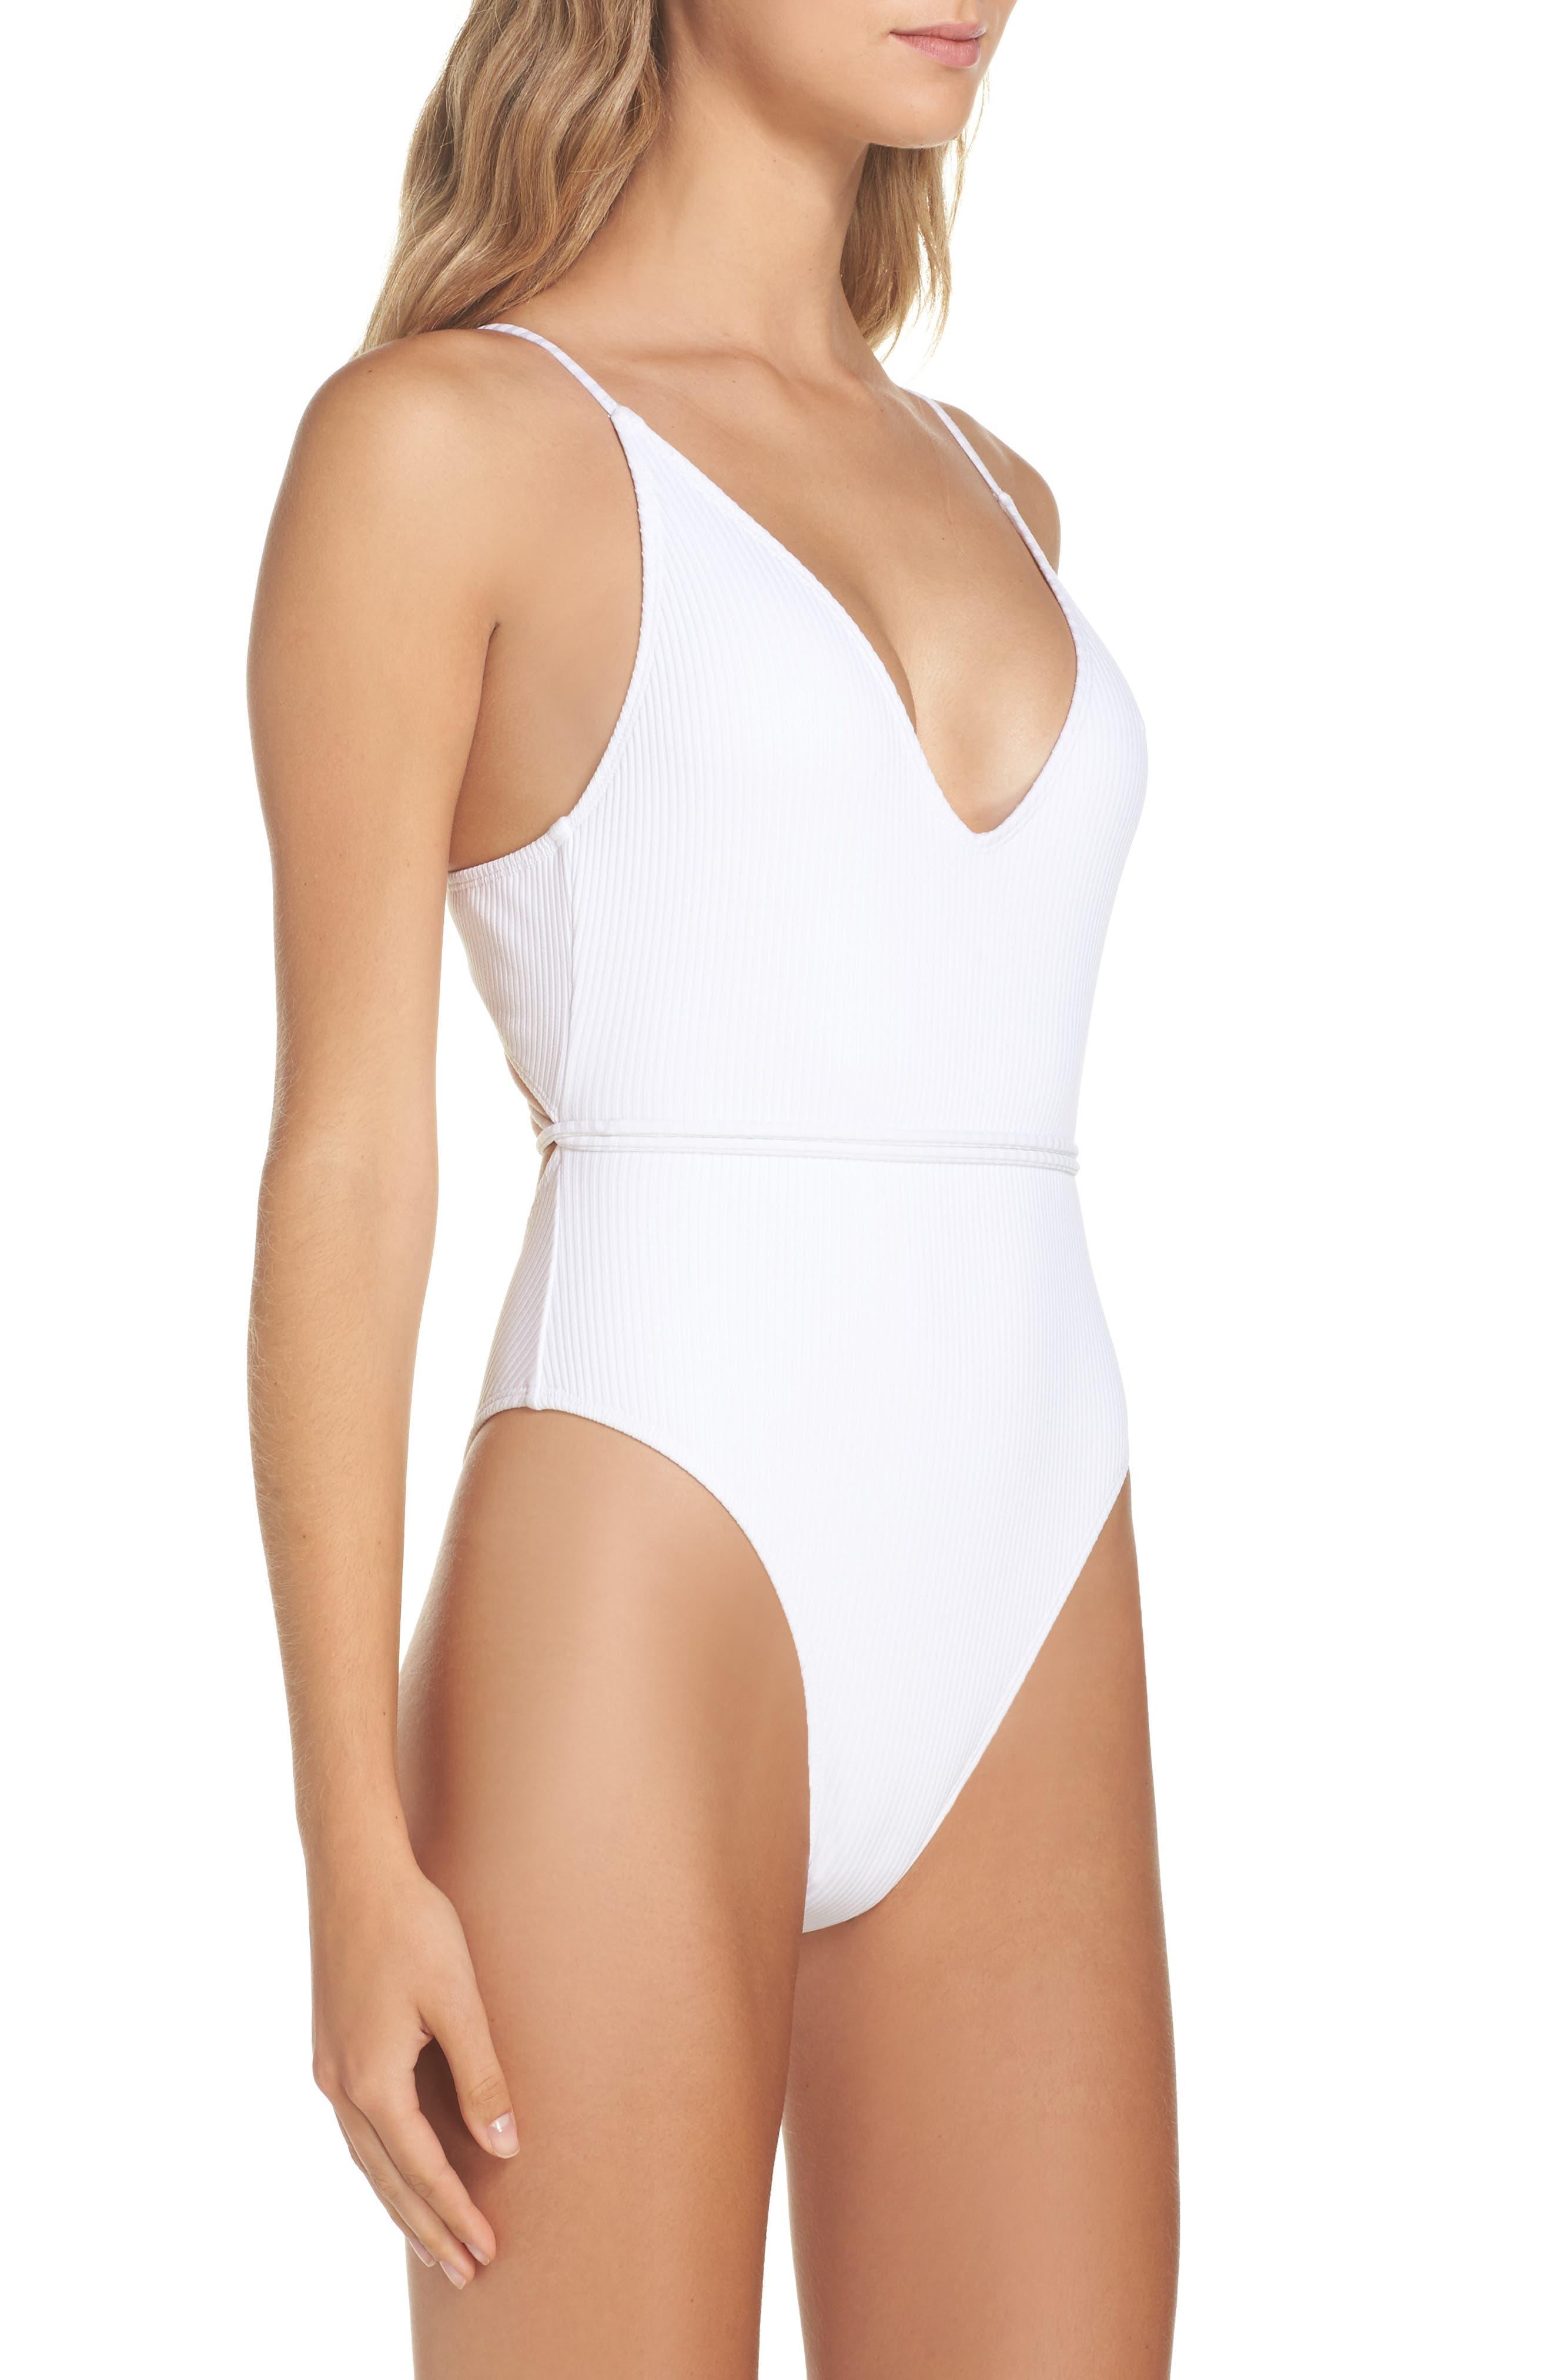 Daiquiri One-Piece Swimsuit,                             Alternate thumbnail 3, color,                             Sea Salt